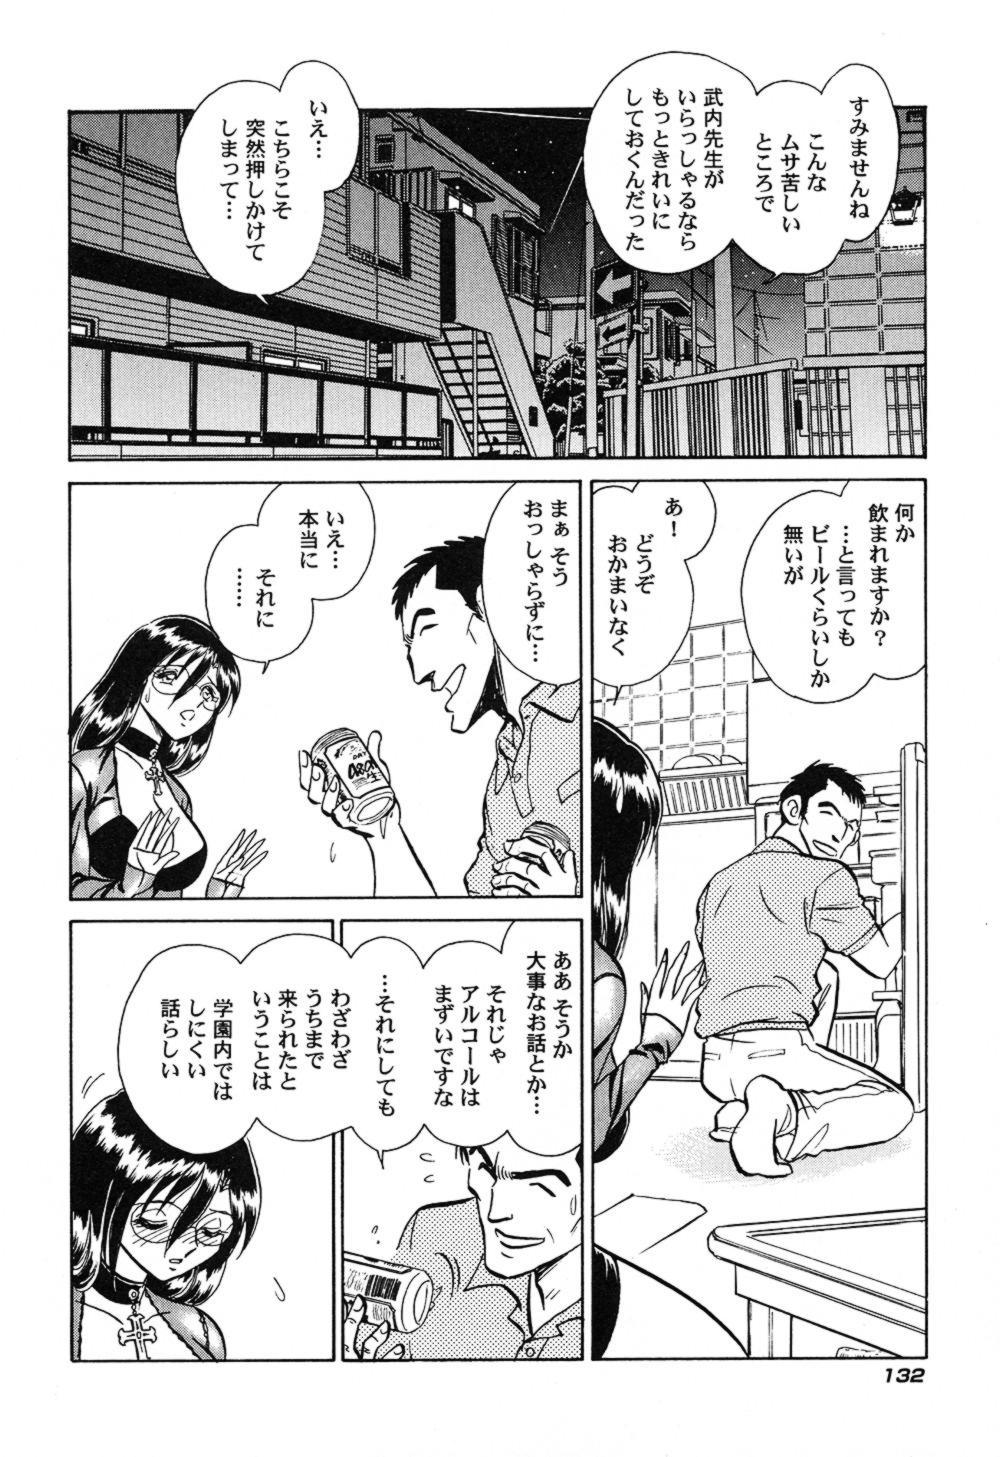 Hageshii Kagai Jugyou 134